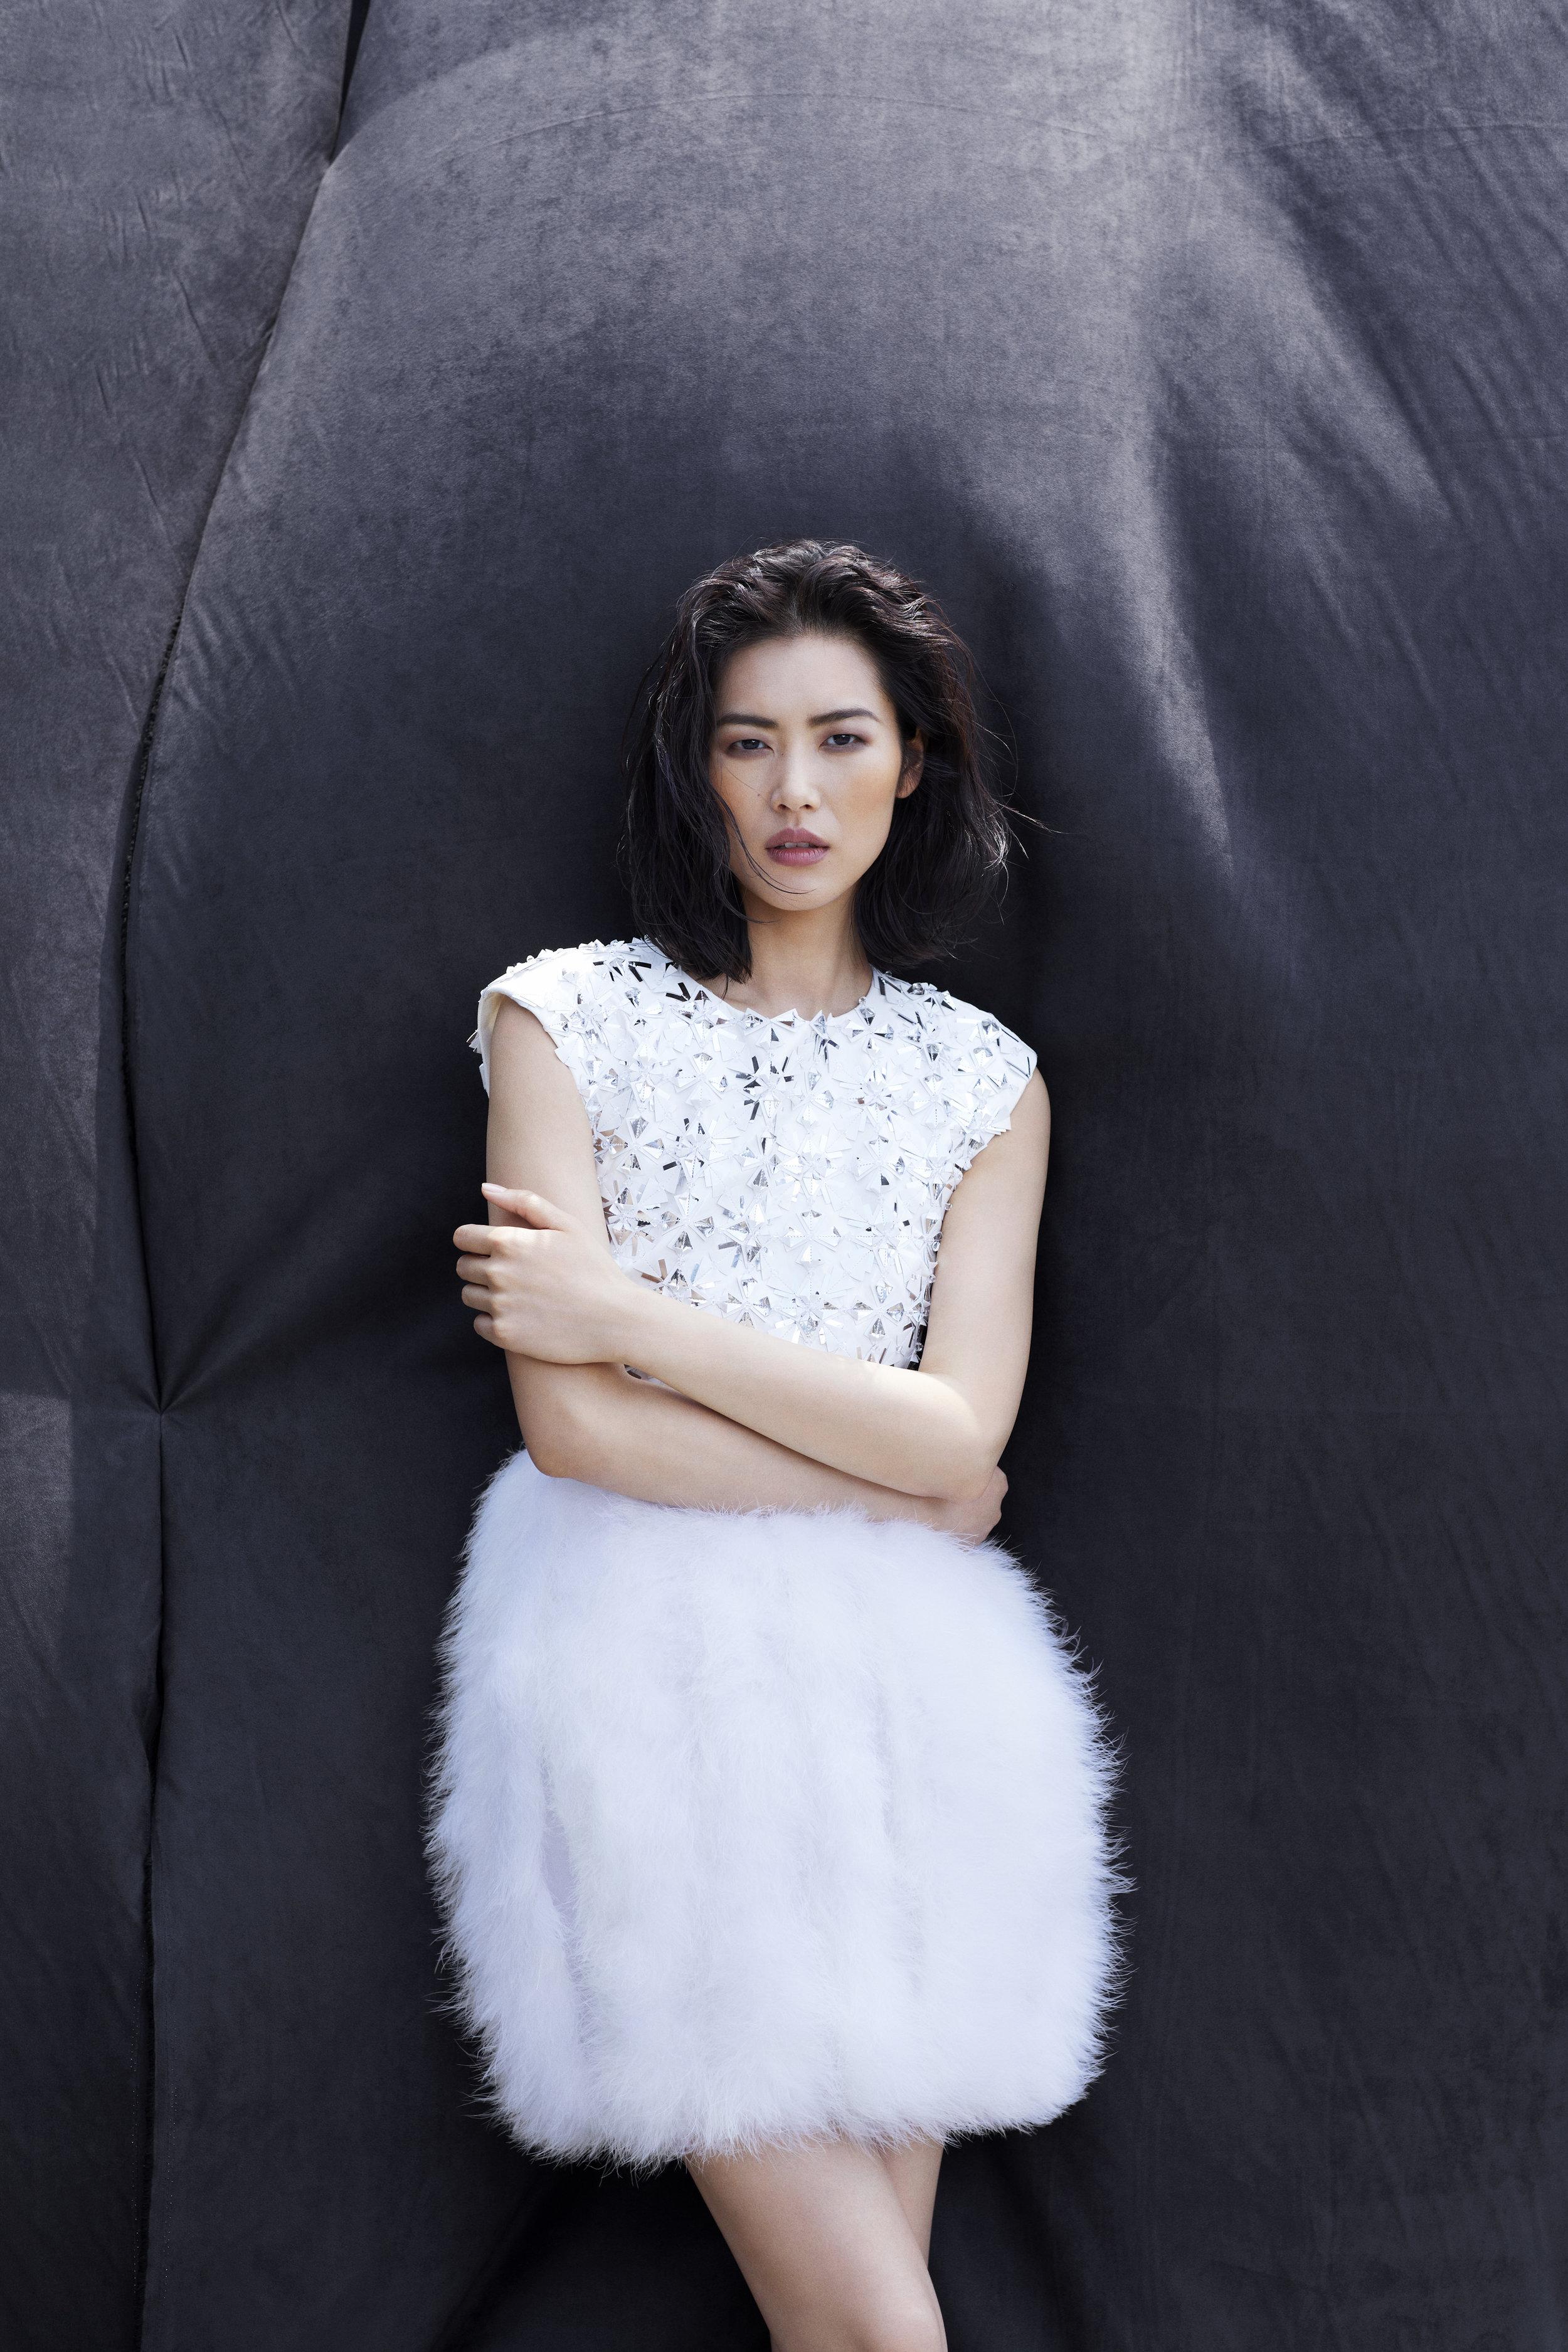 24966_Vogue_Thailand_Liu_Wen_06_046_V2.jpg